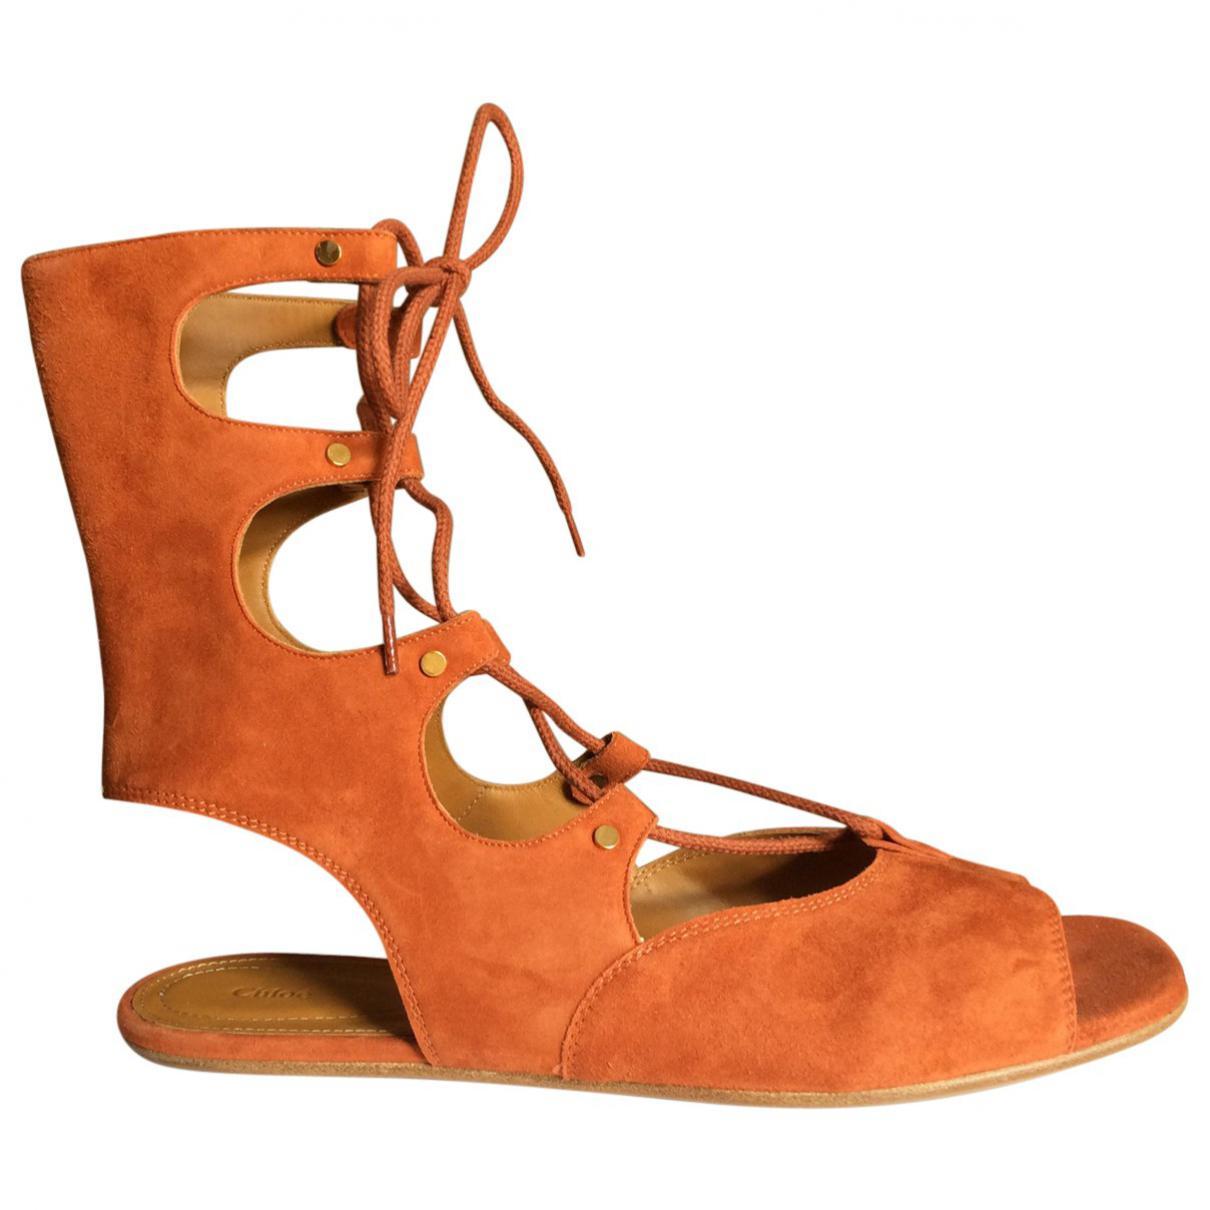 Pre-owned - Sandals Chlo KLiJEZDK